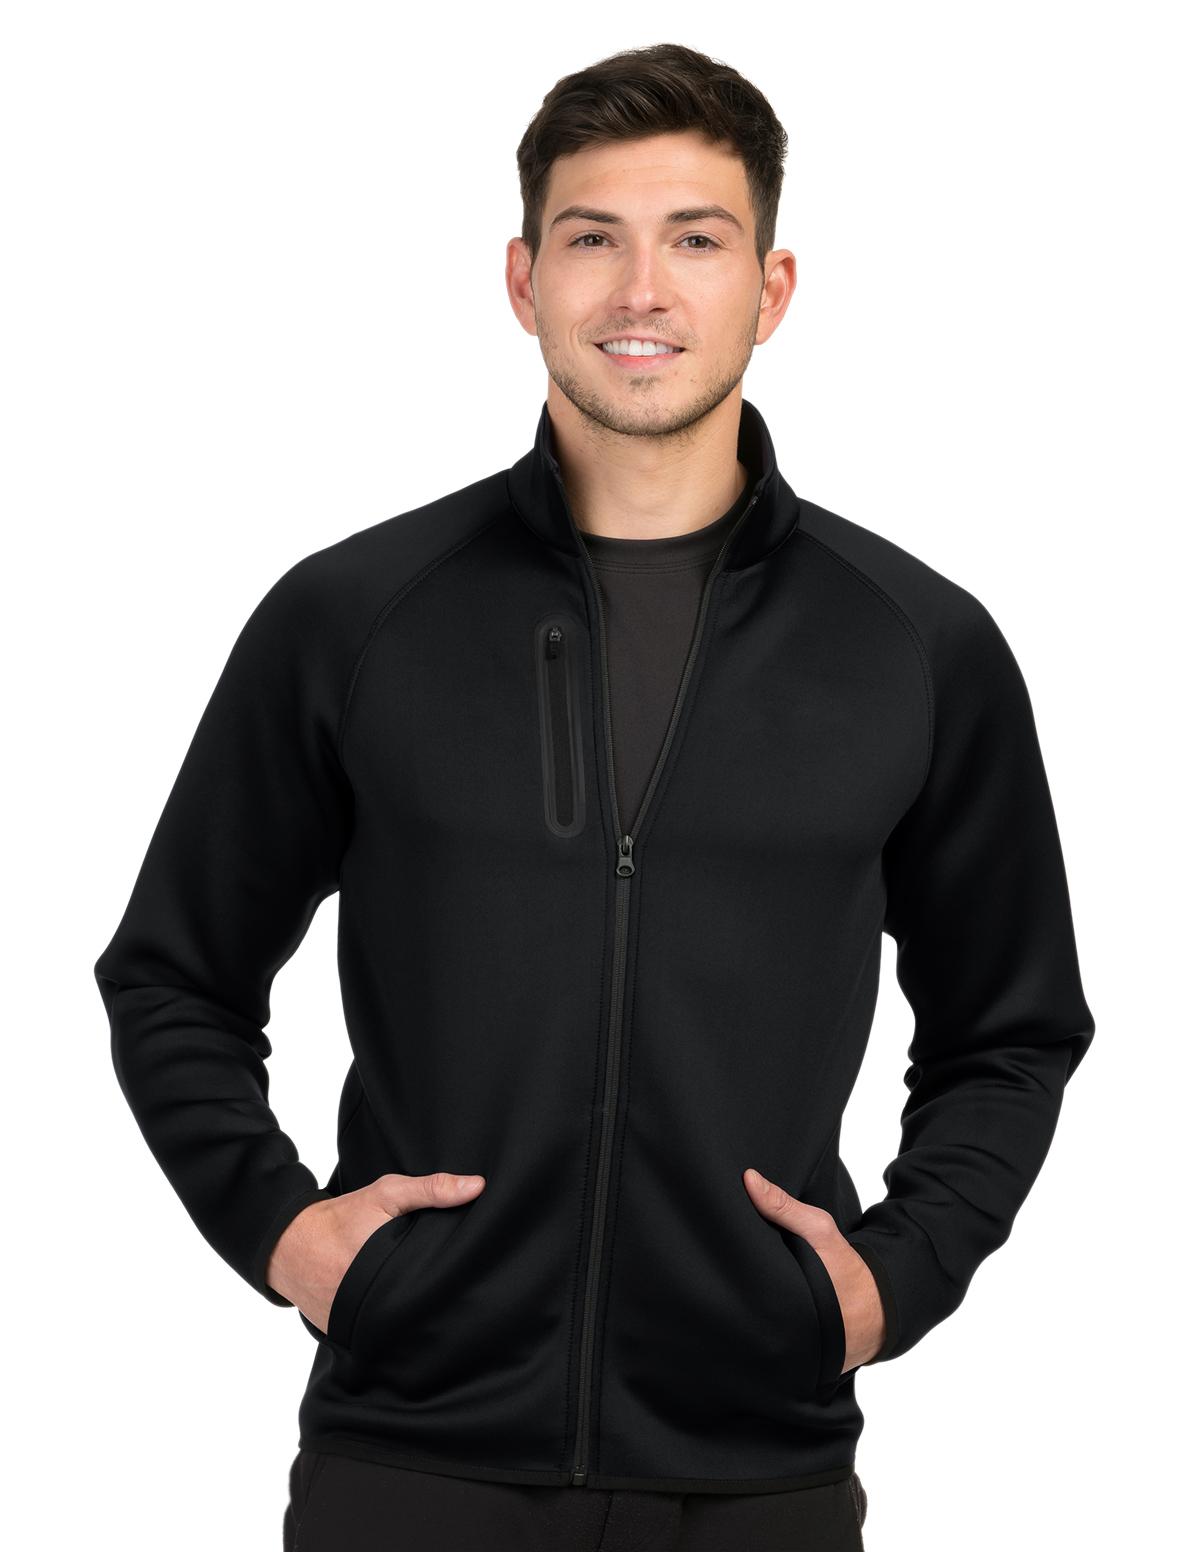 Tri-Mountain Performance F7000 - M's Layer Knit Jacket